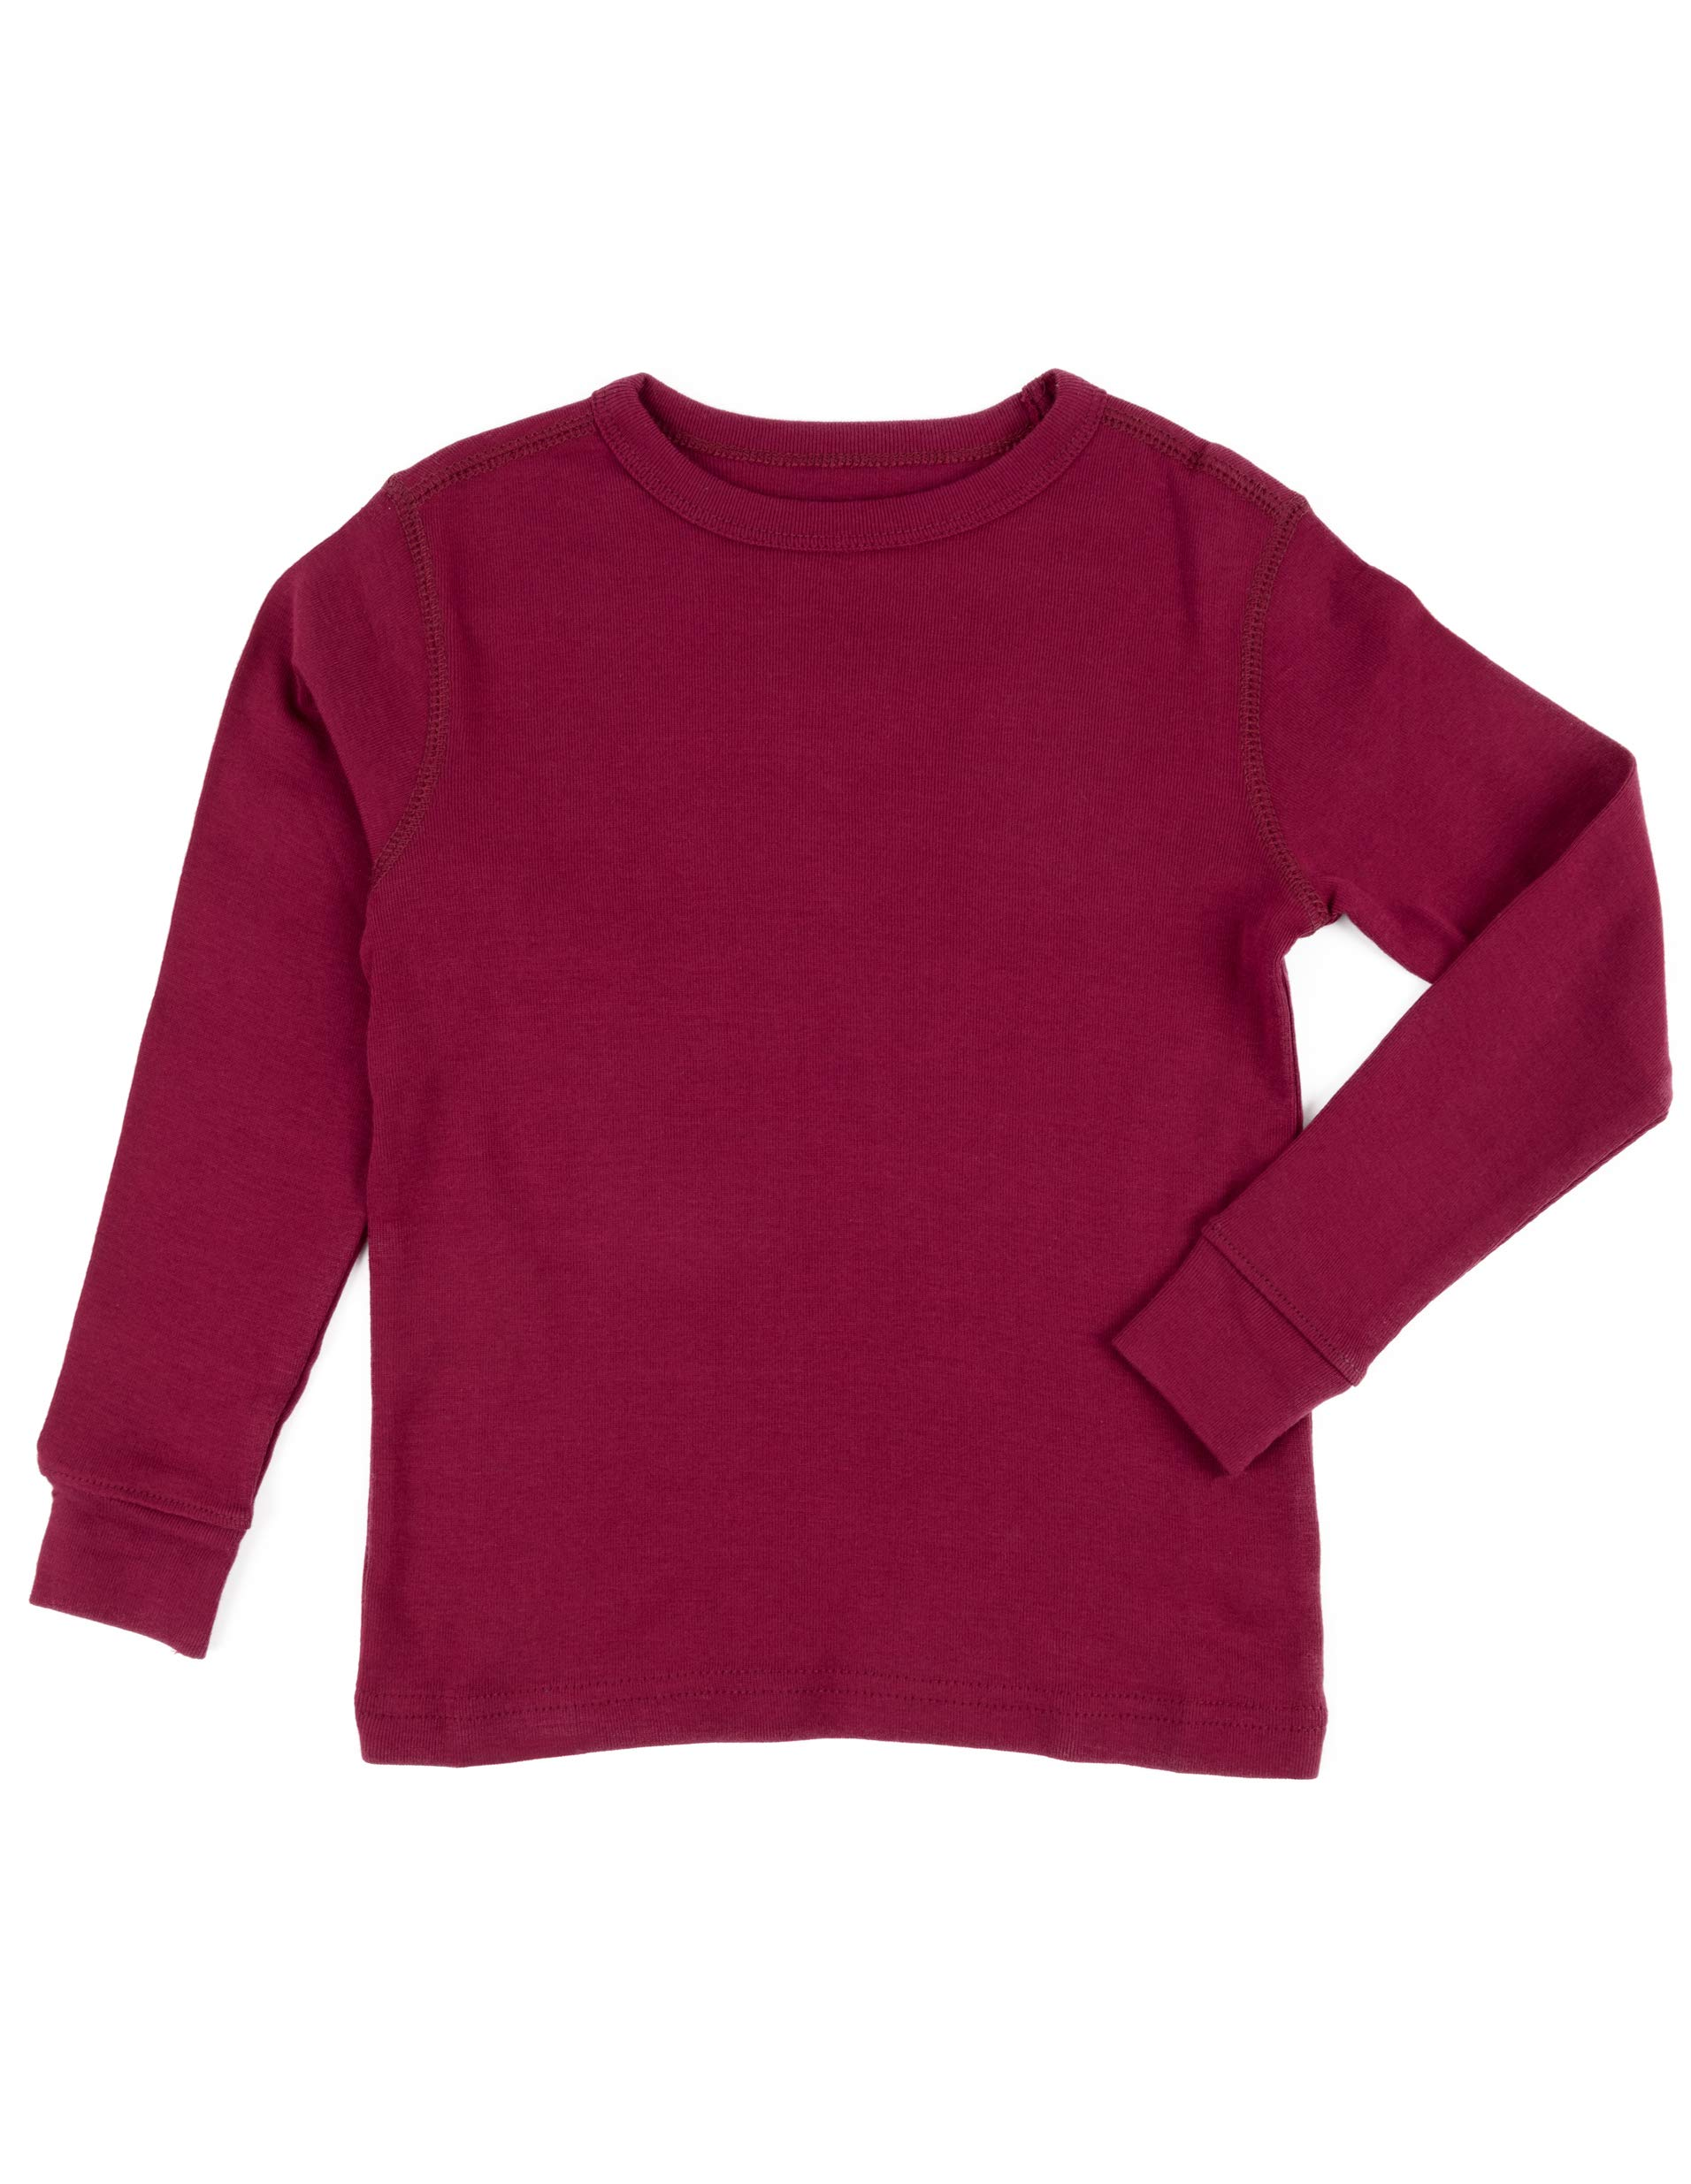 14 Leveret Boys Girls Lt Pink Long Sleeve Solid T-Shirt 100/% Cotton 2 Toddler